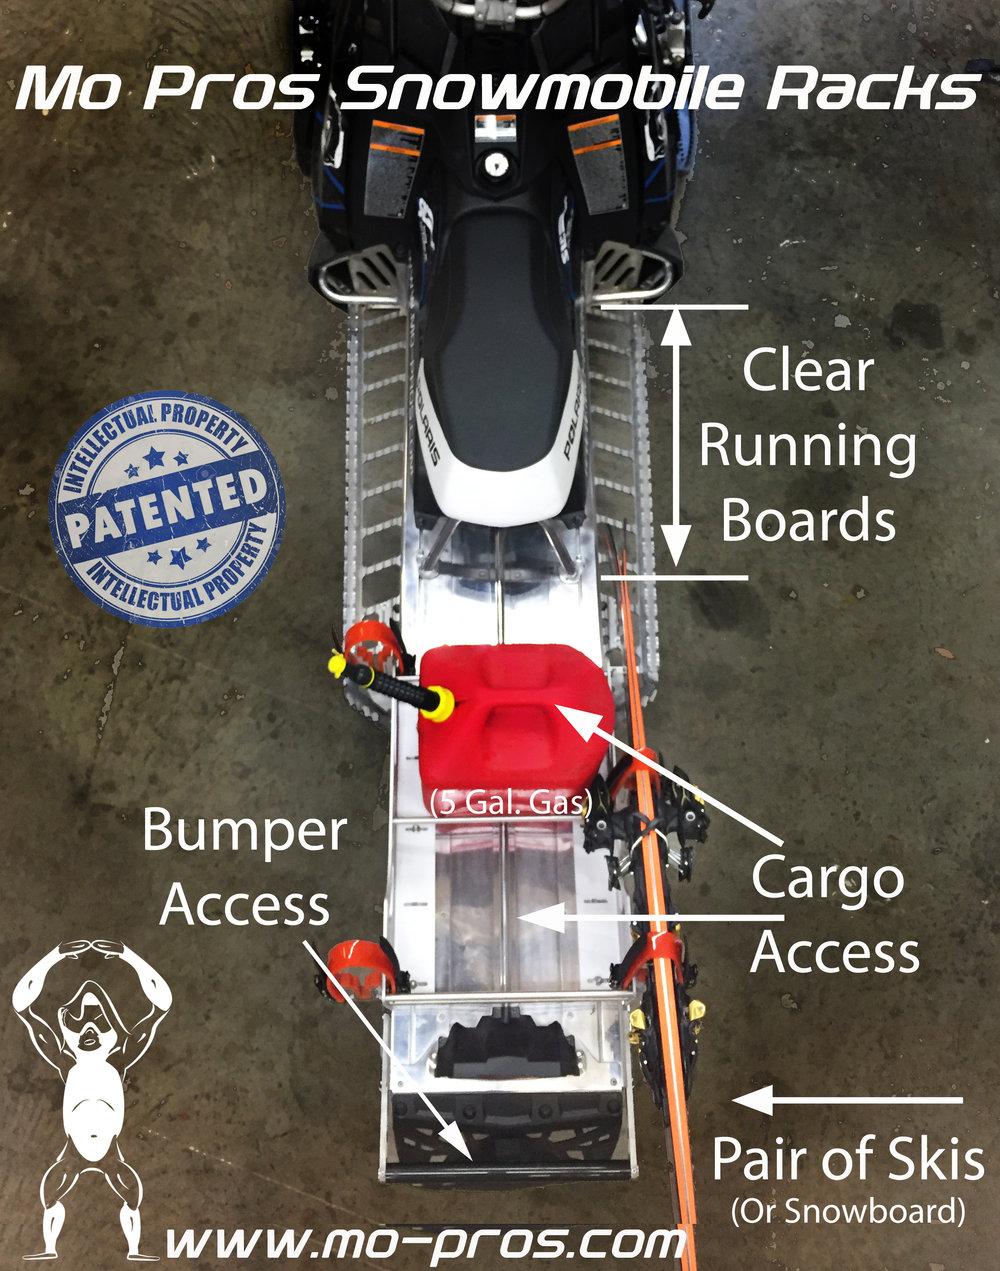 Snowmobile Snowboard Rack_Snowmobile Ski Rack_Snowmobile Snowboard Rack_Mo Pros_2.jpg